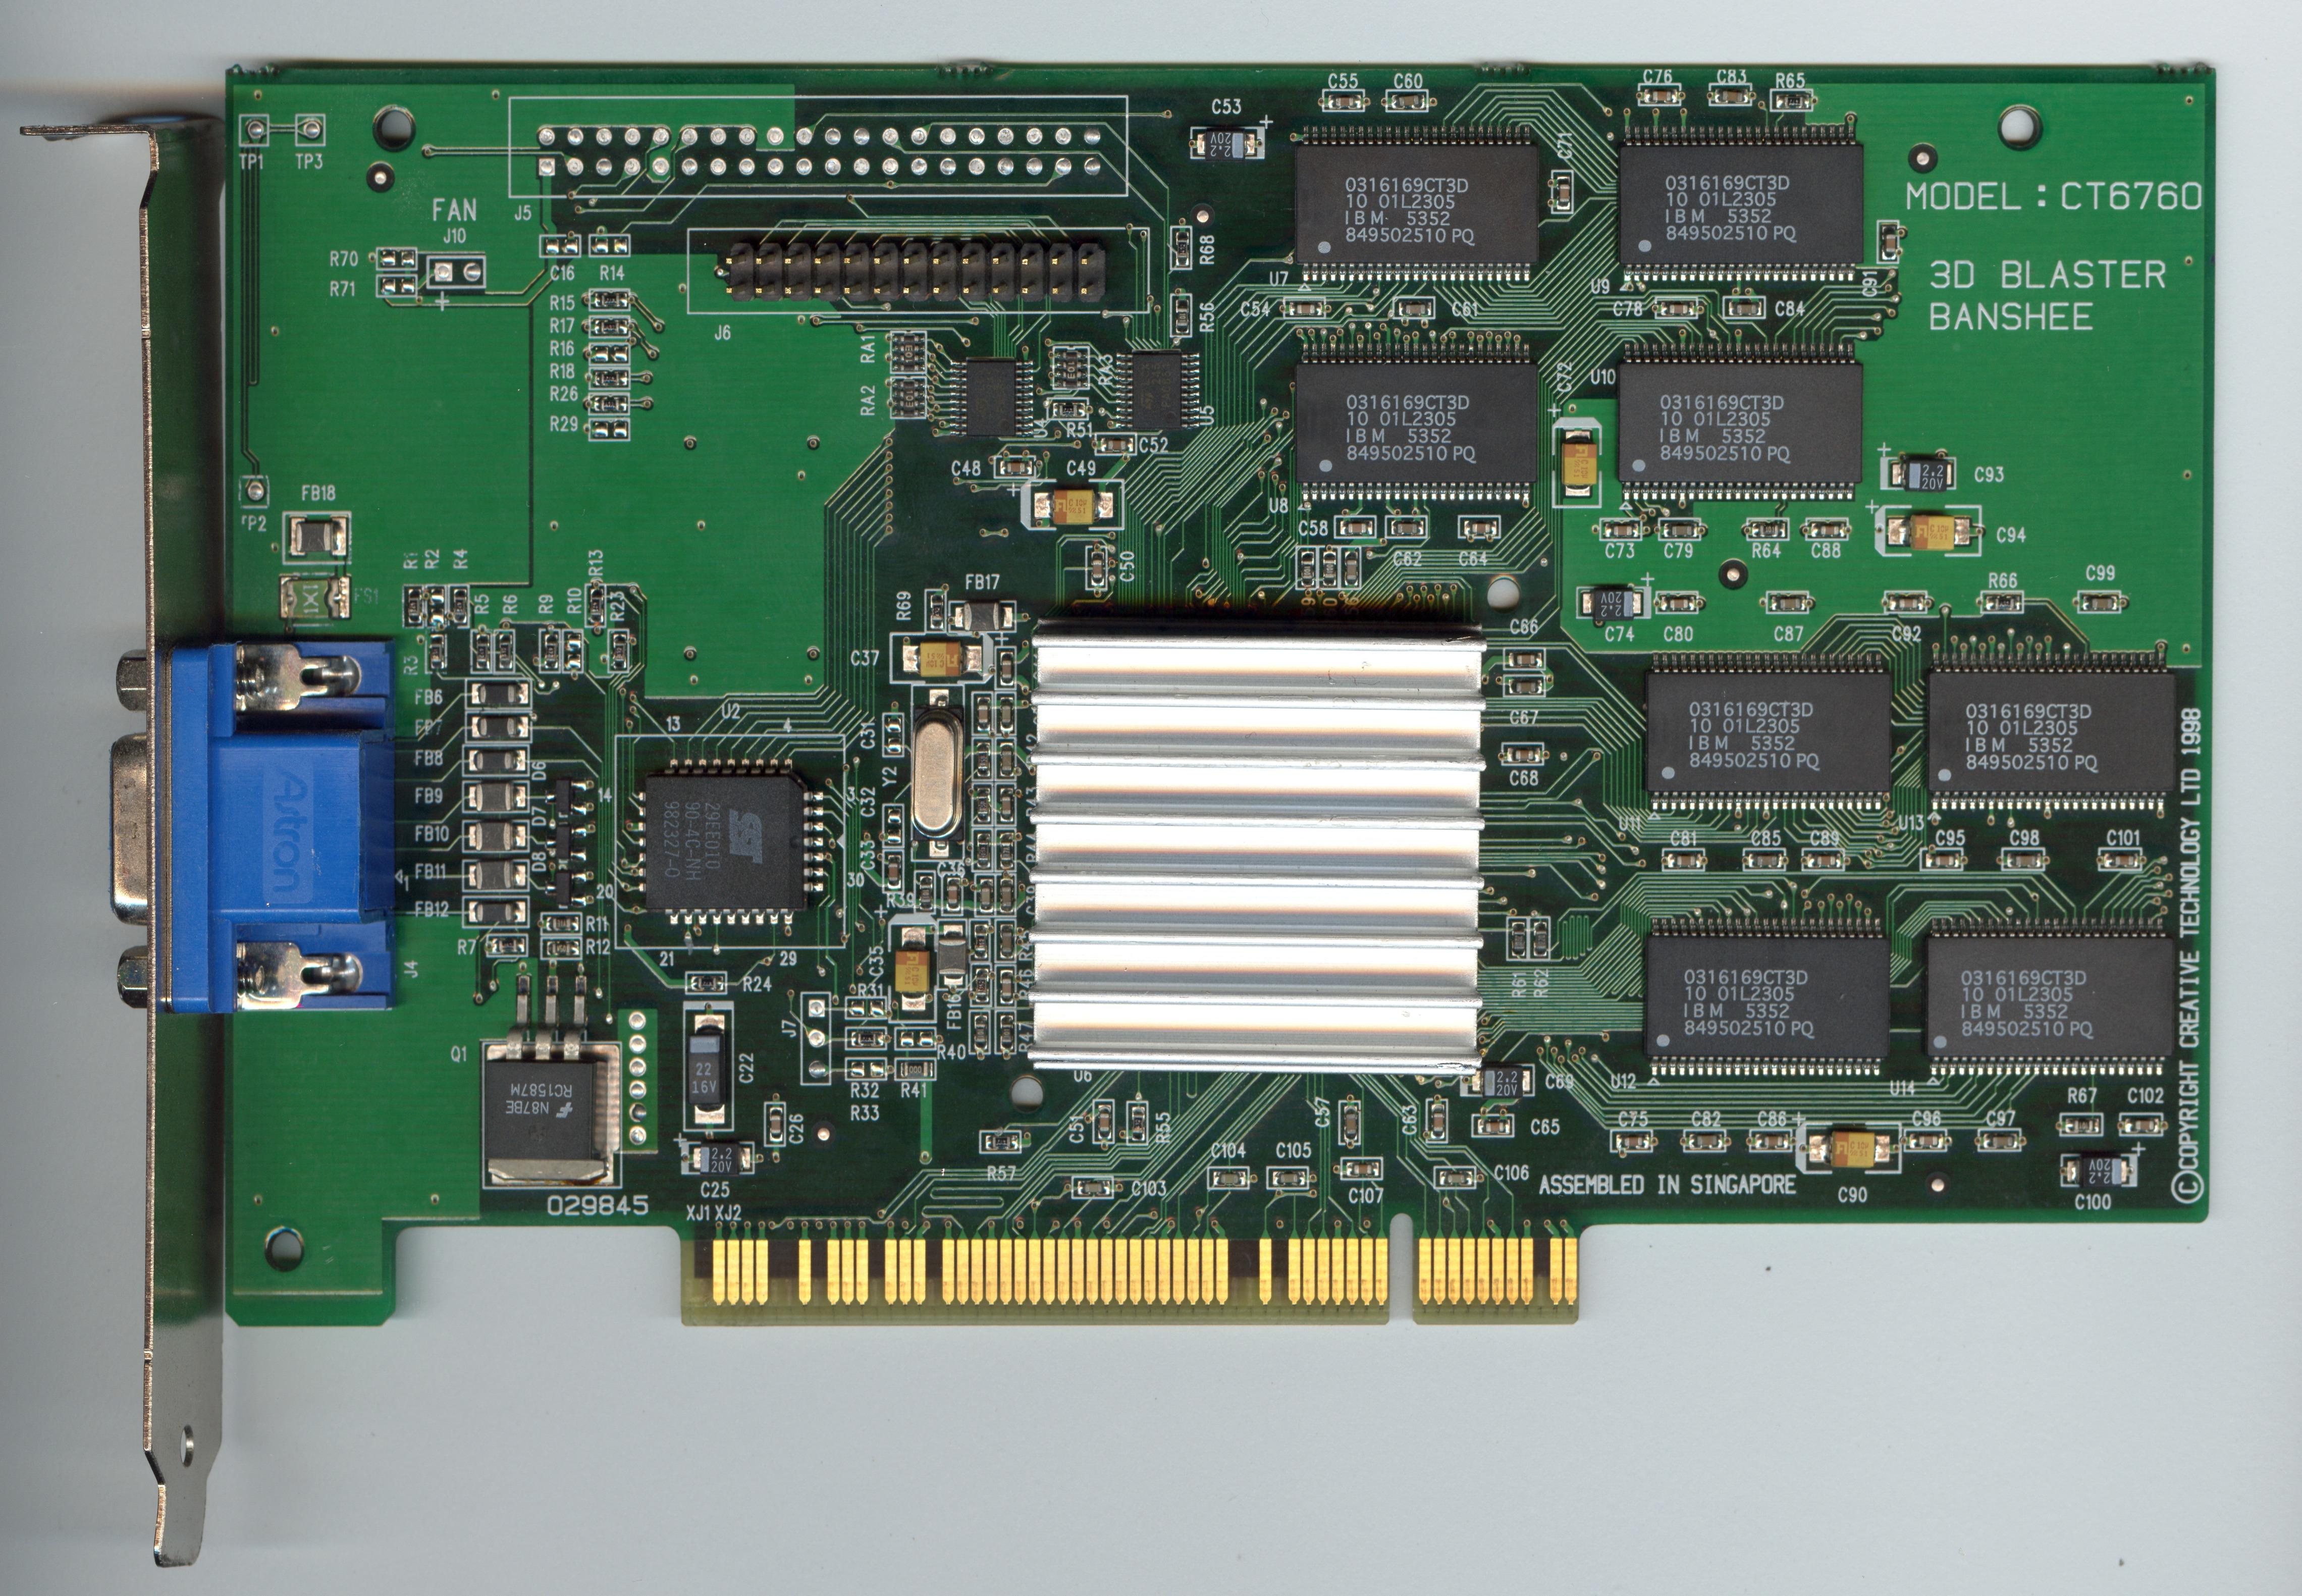 Creative 3D Blaster Banshee PCI